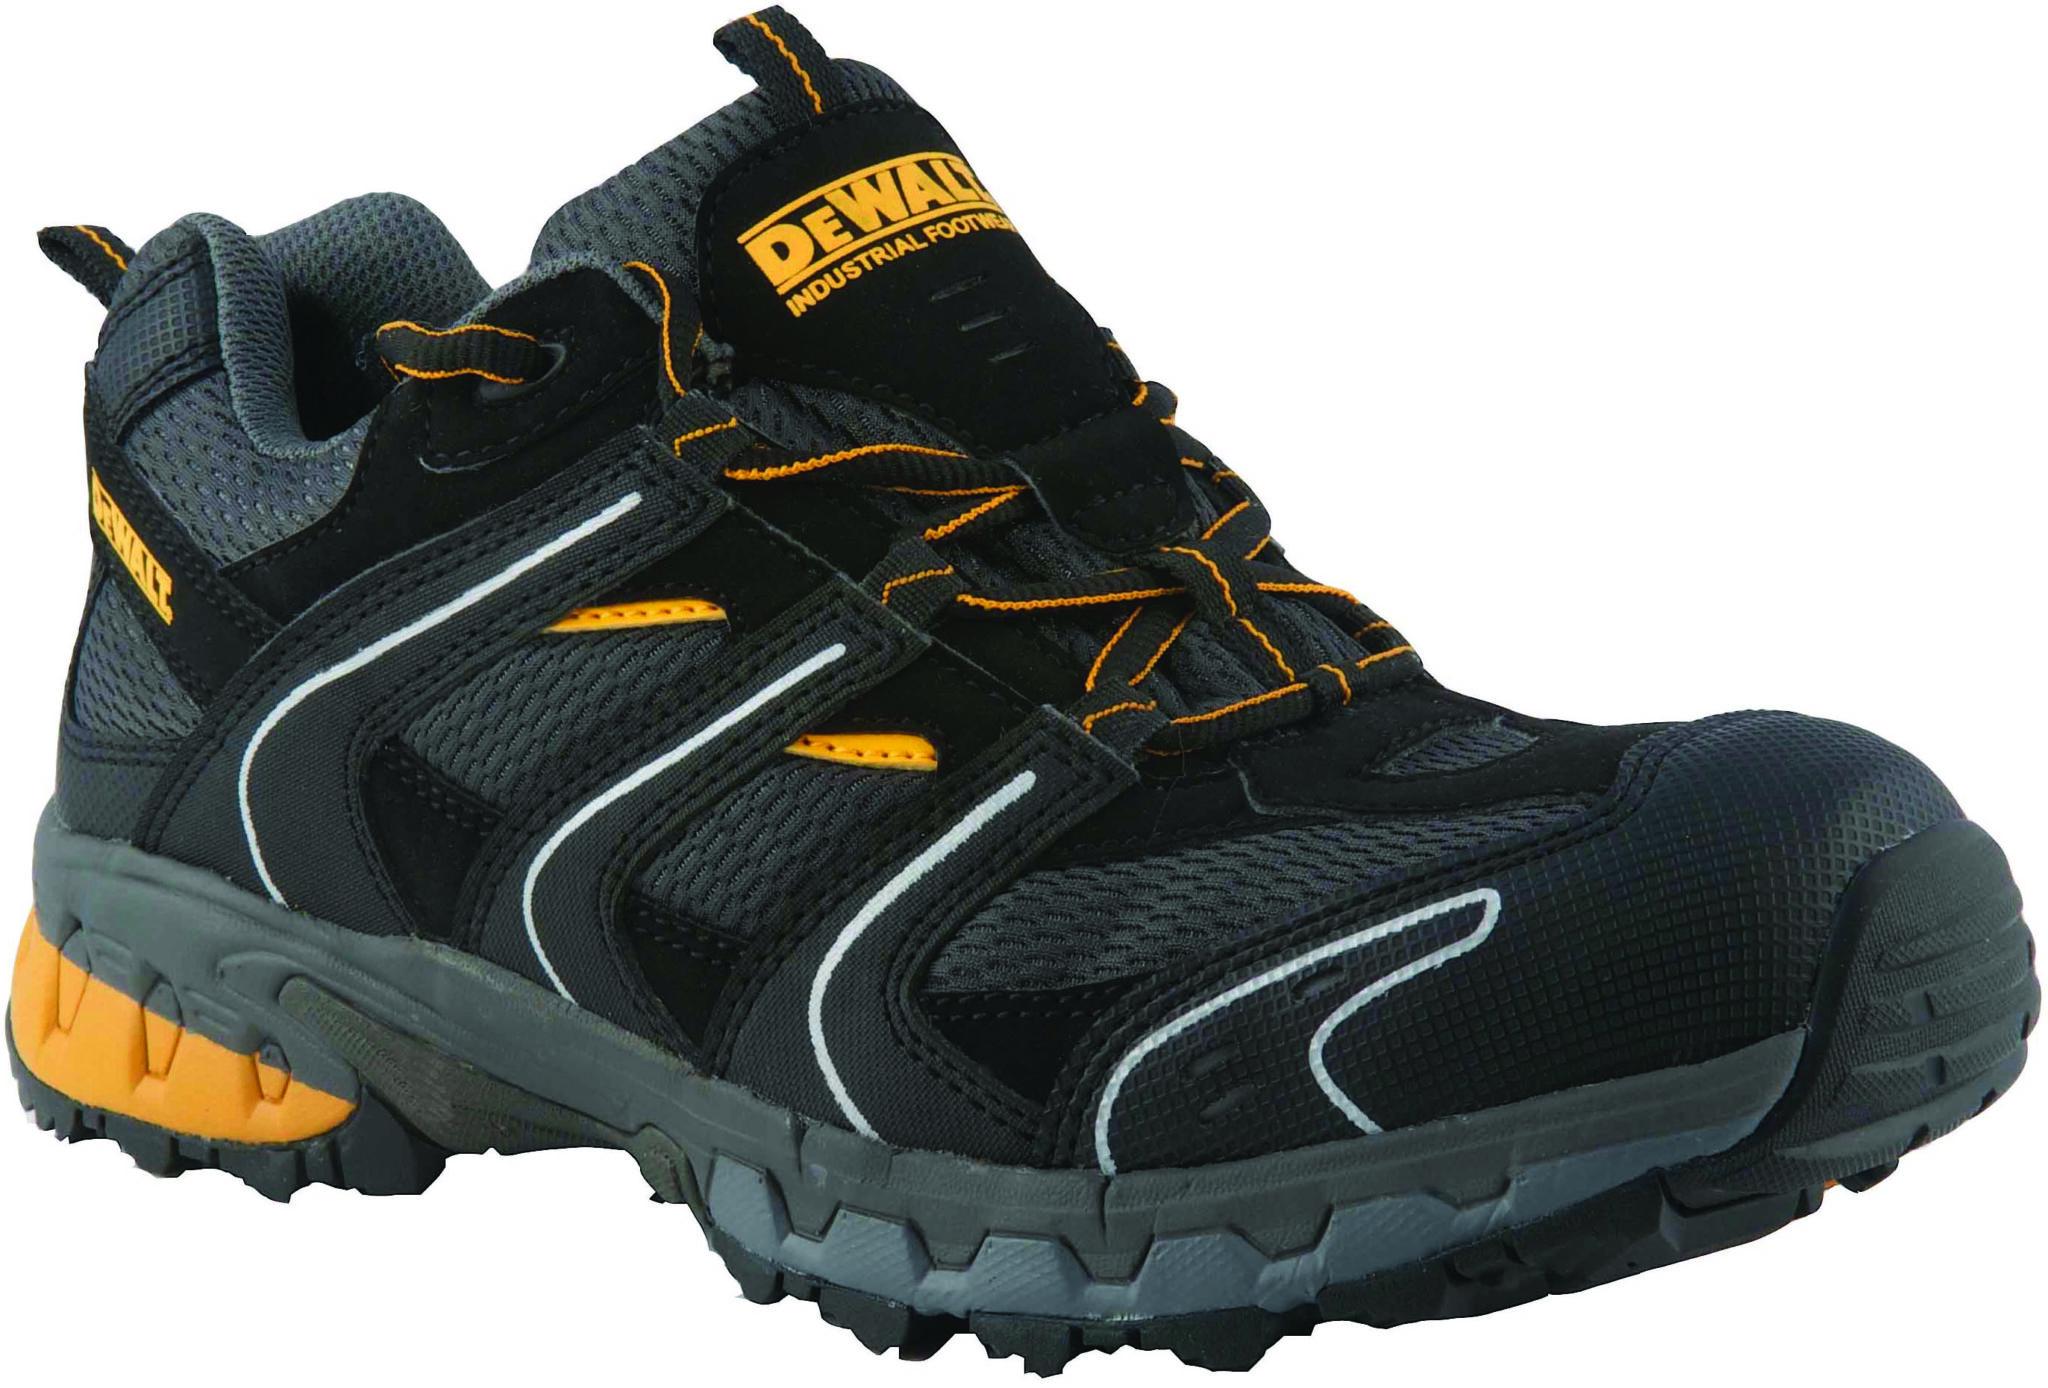 c8e08b6ea DeWalt Cutter Safety Trainer | Branded Safety Workwear | Safety Stock